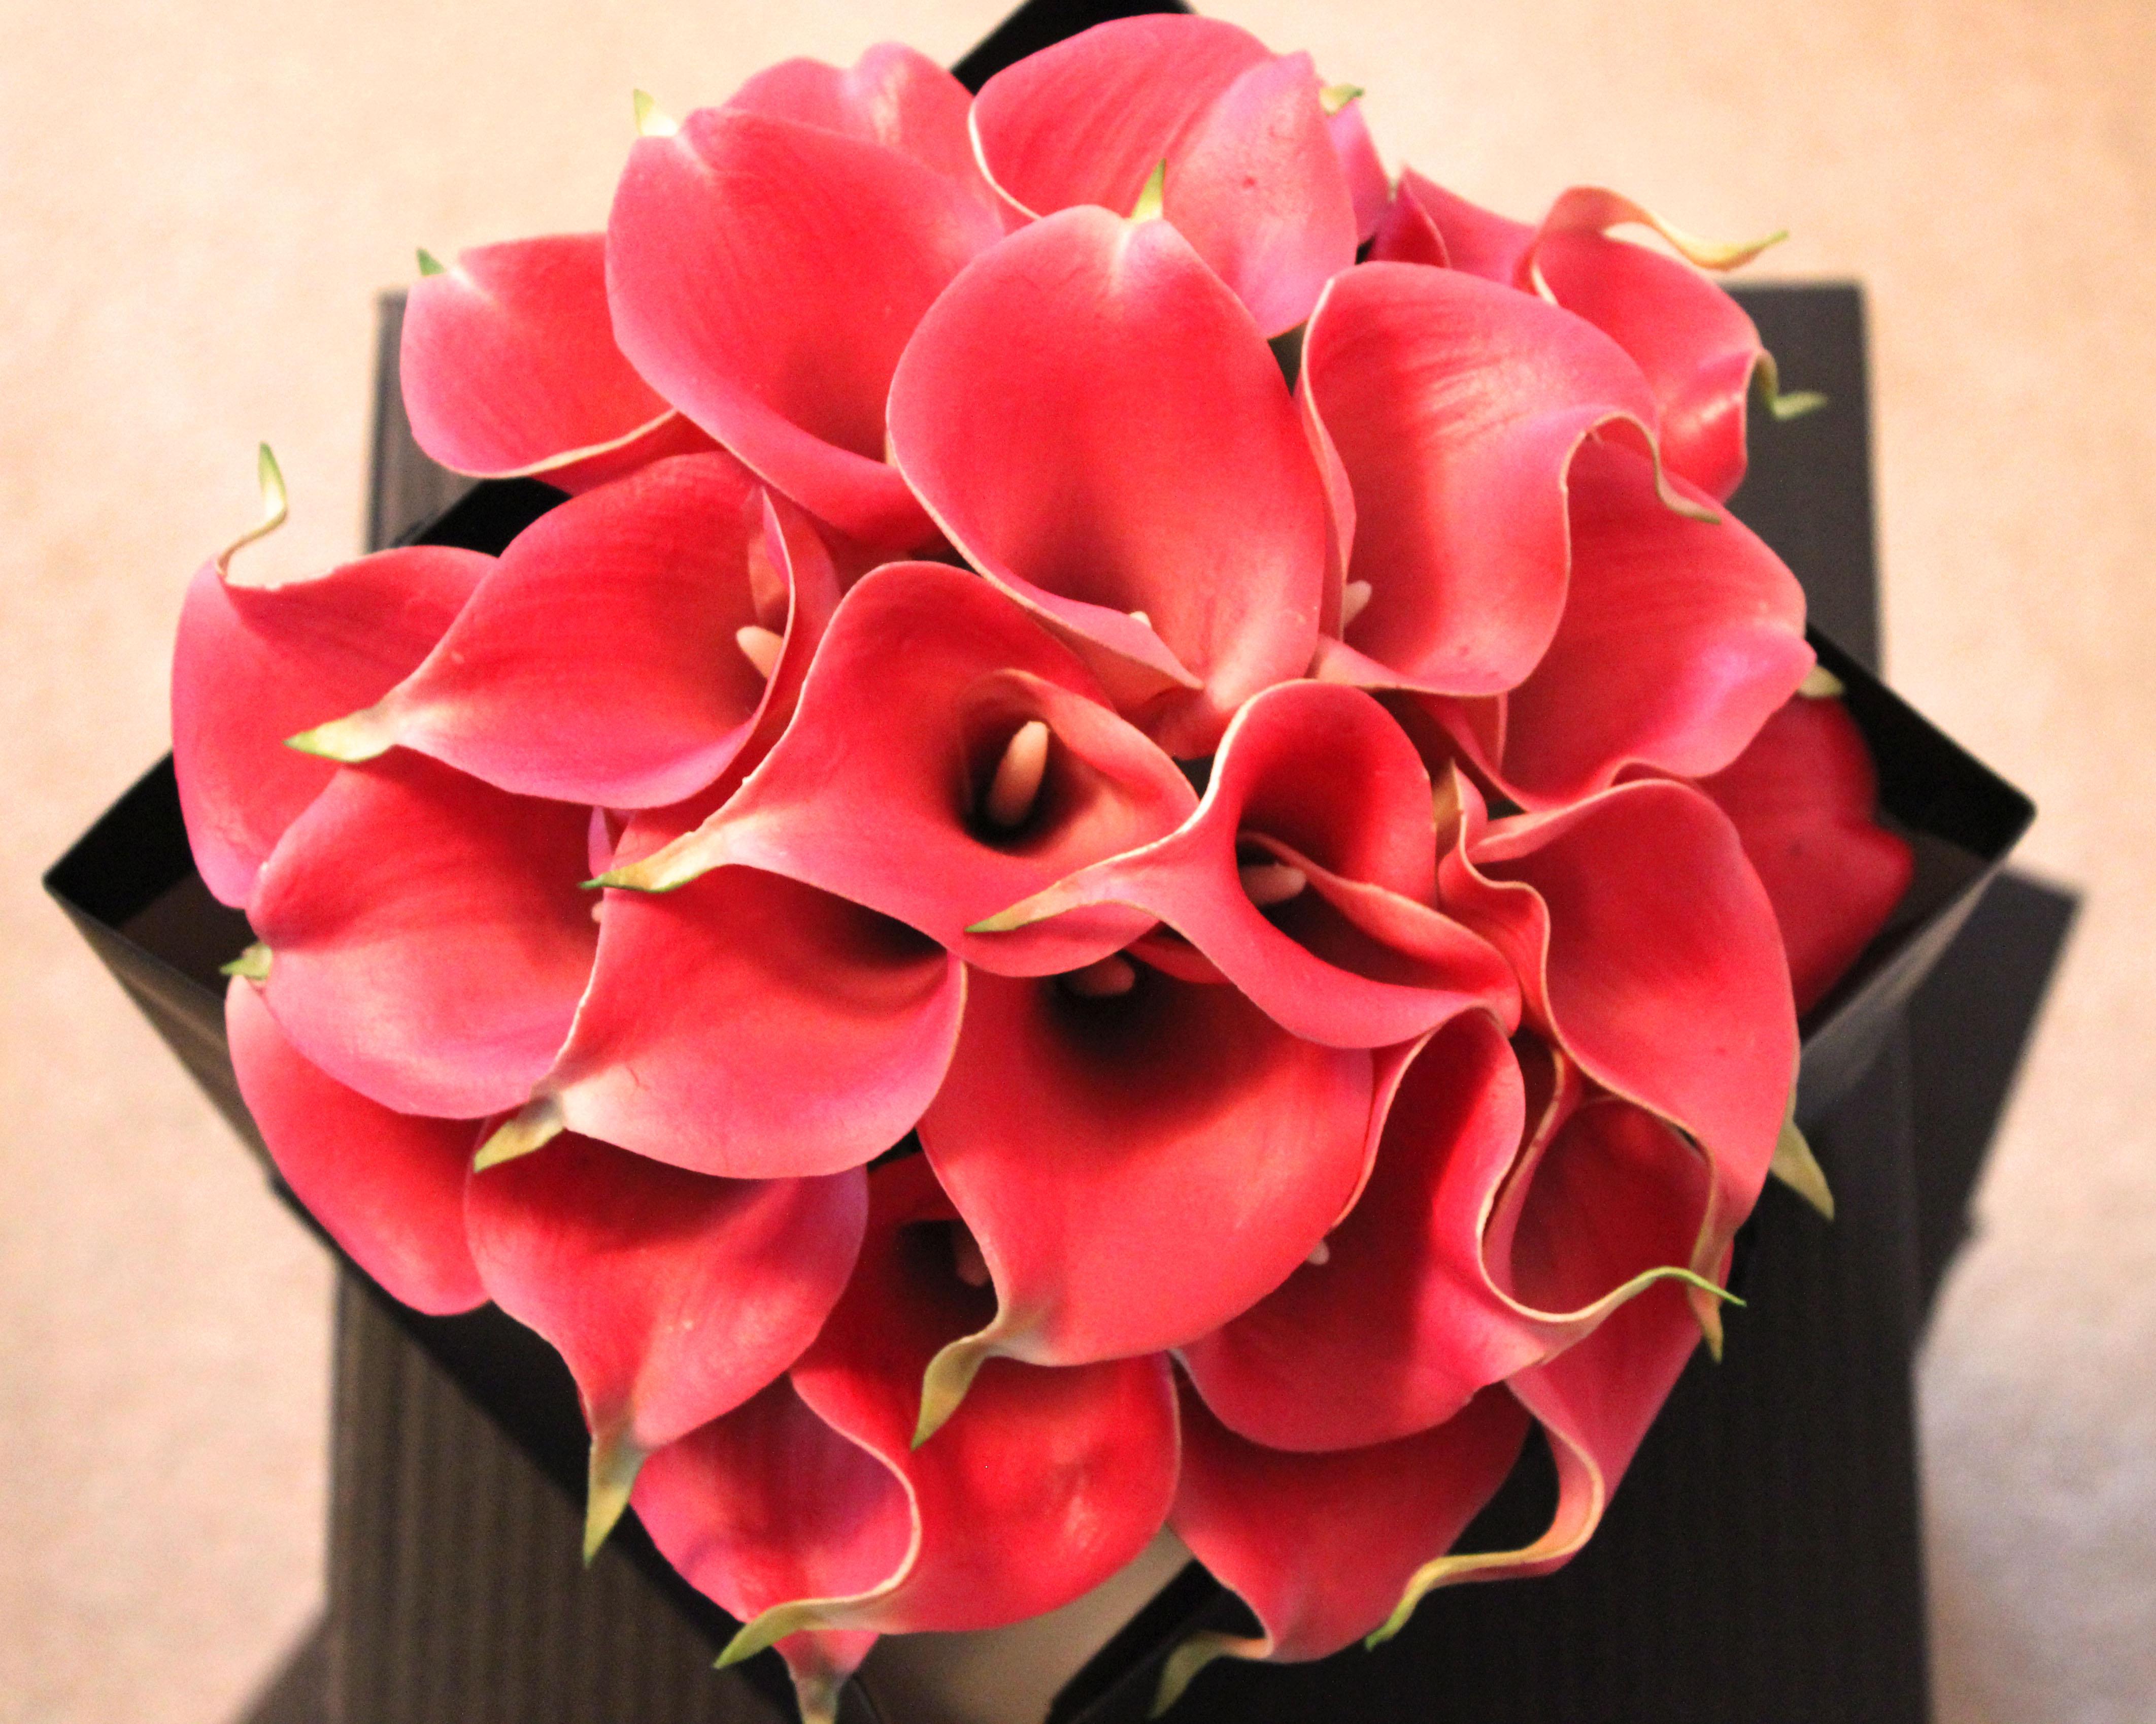 Blushing Bride Artificial Bouquet